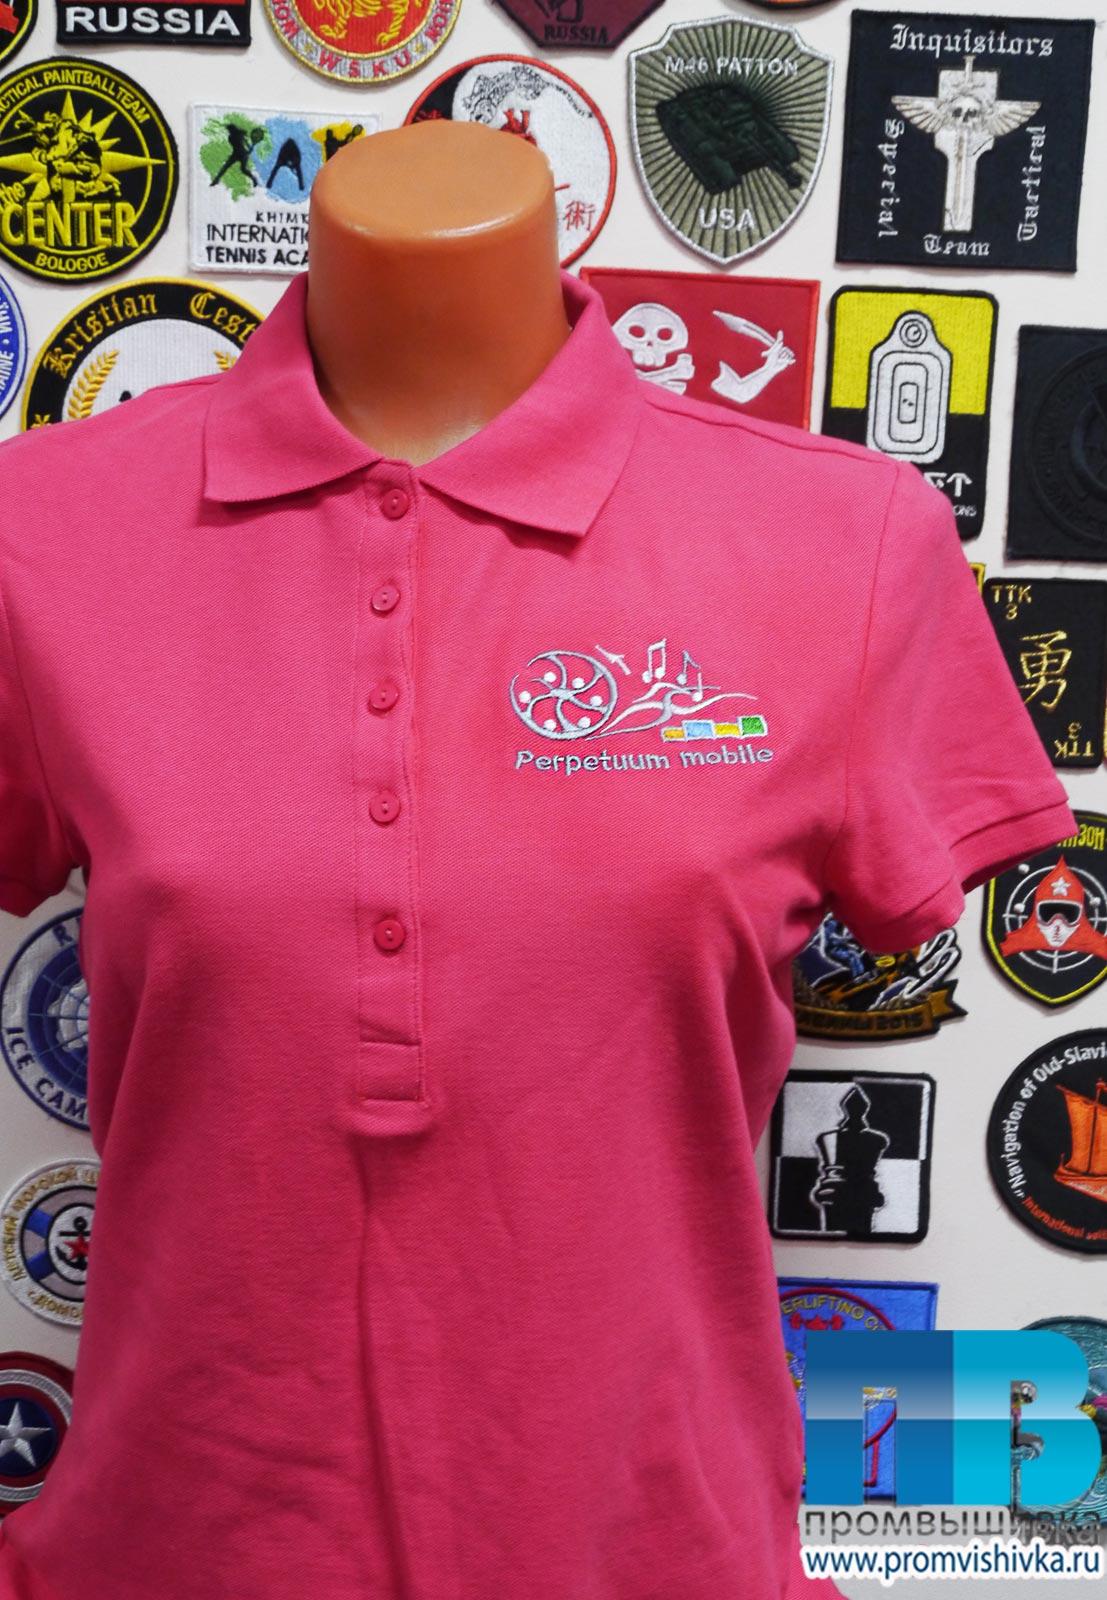 fbdcb8e703a5a35 Поло на заказ. Заказать рубашки-поло с нанесением